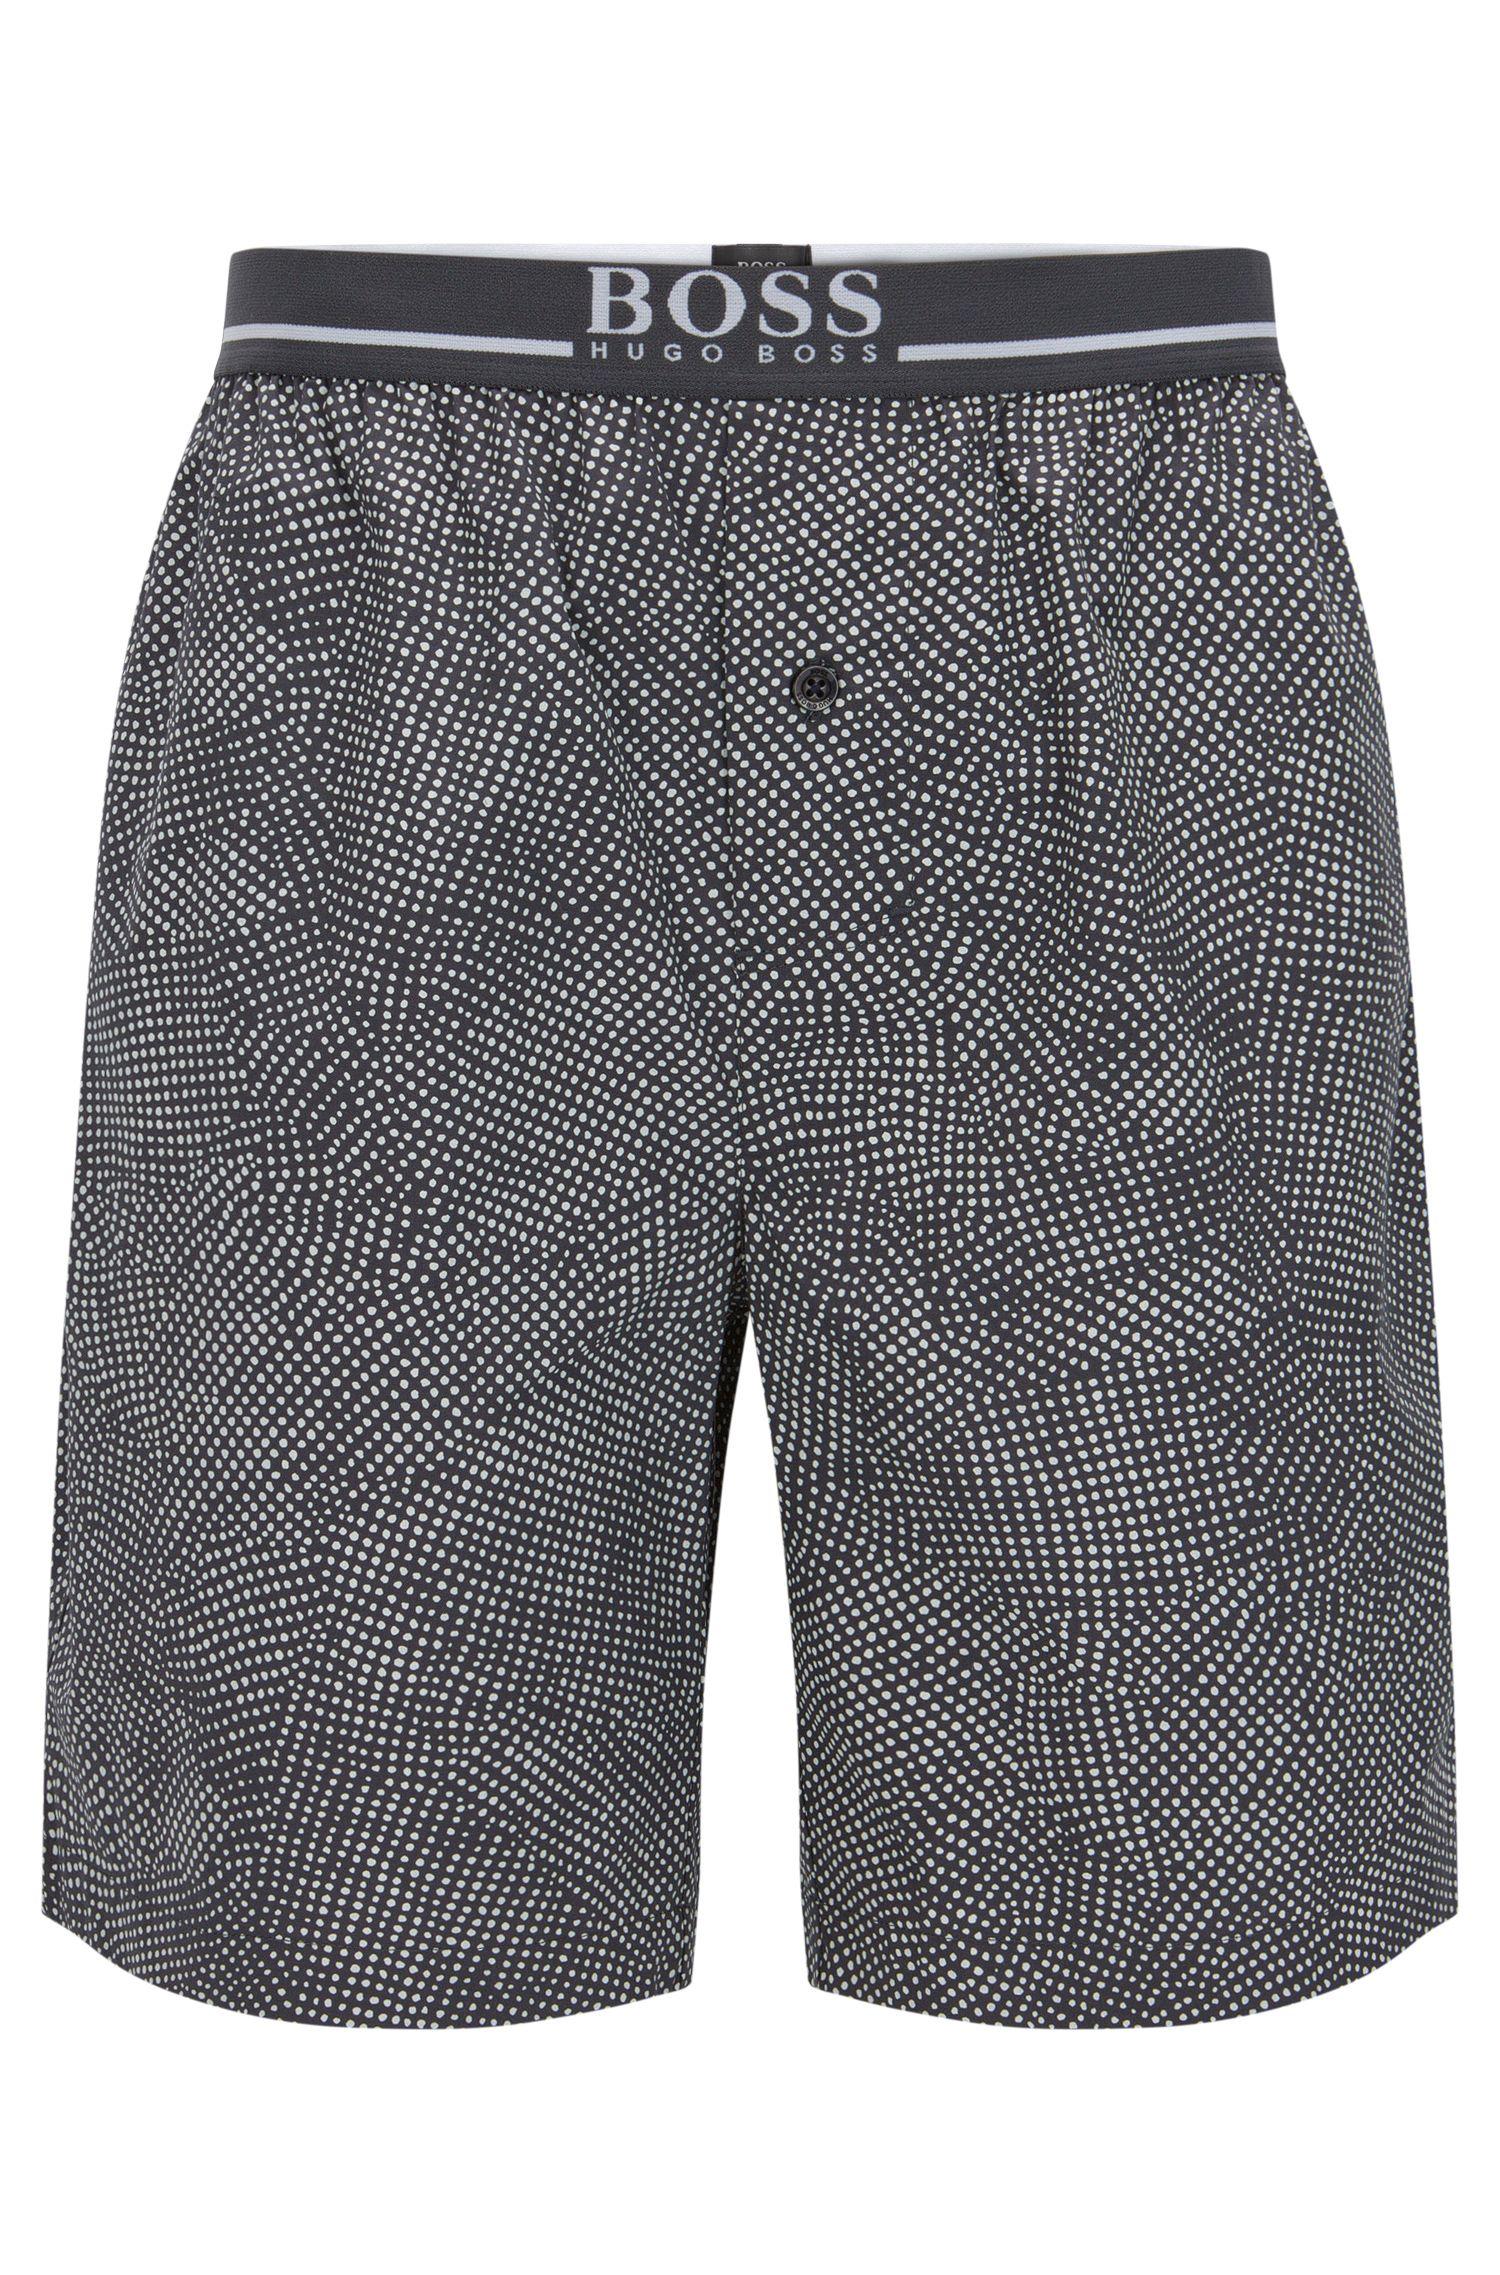 'Short Pant EW' | Microdot Cotton Shorts